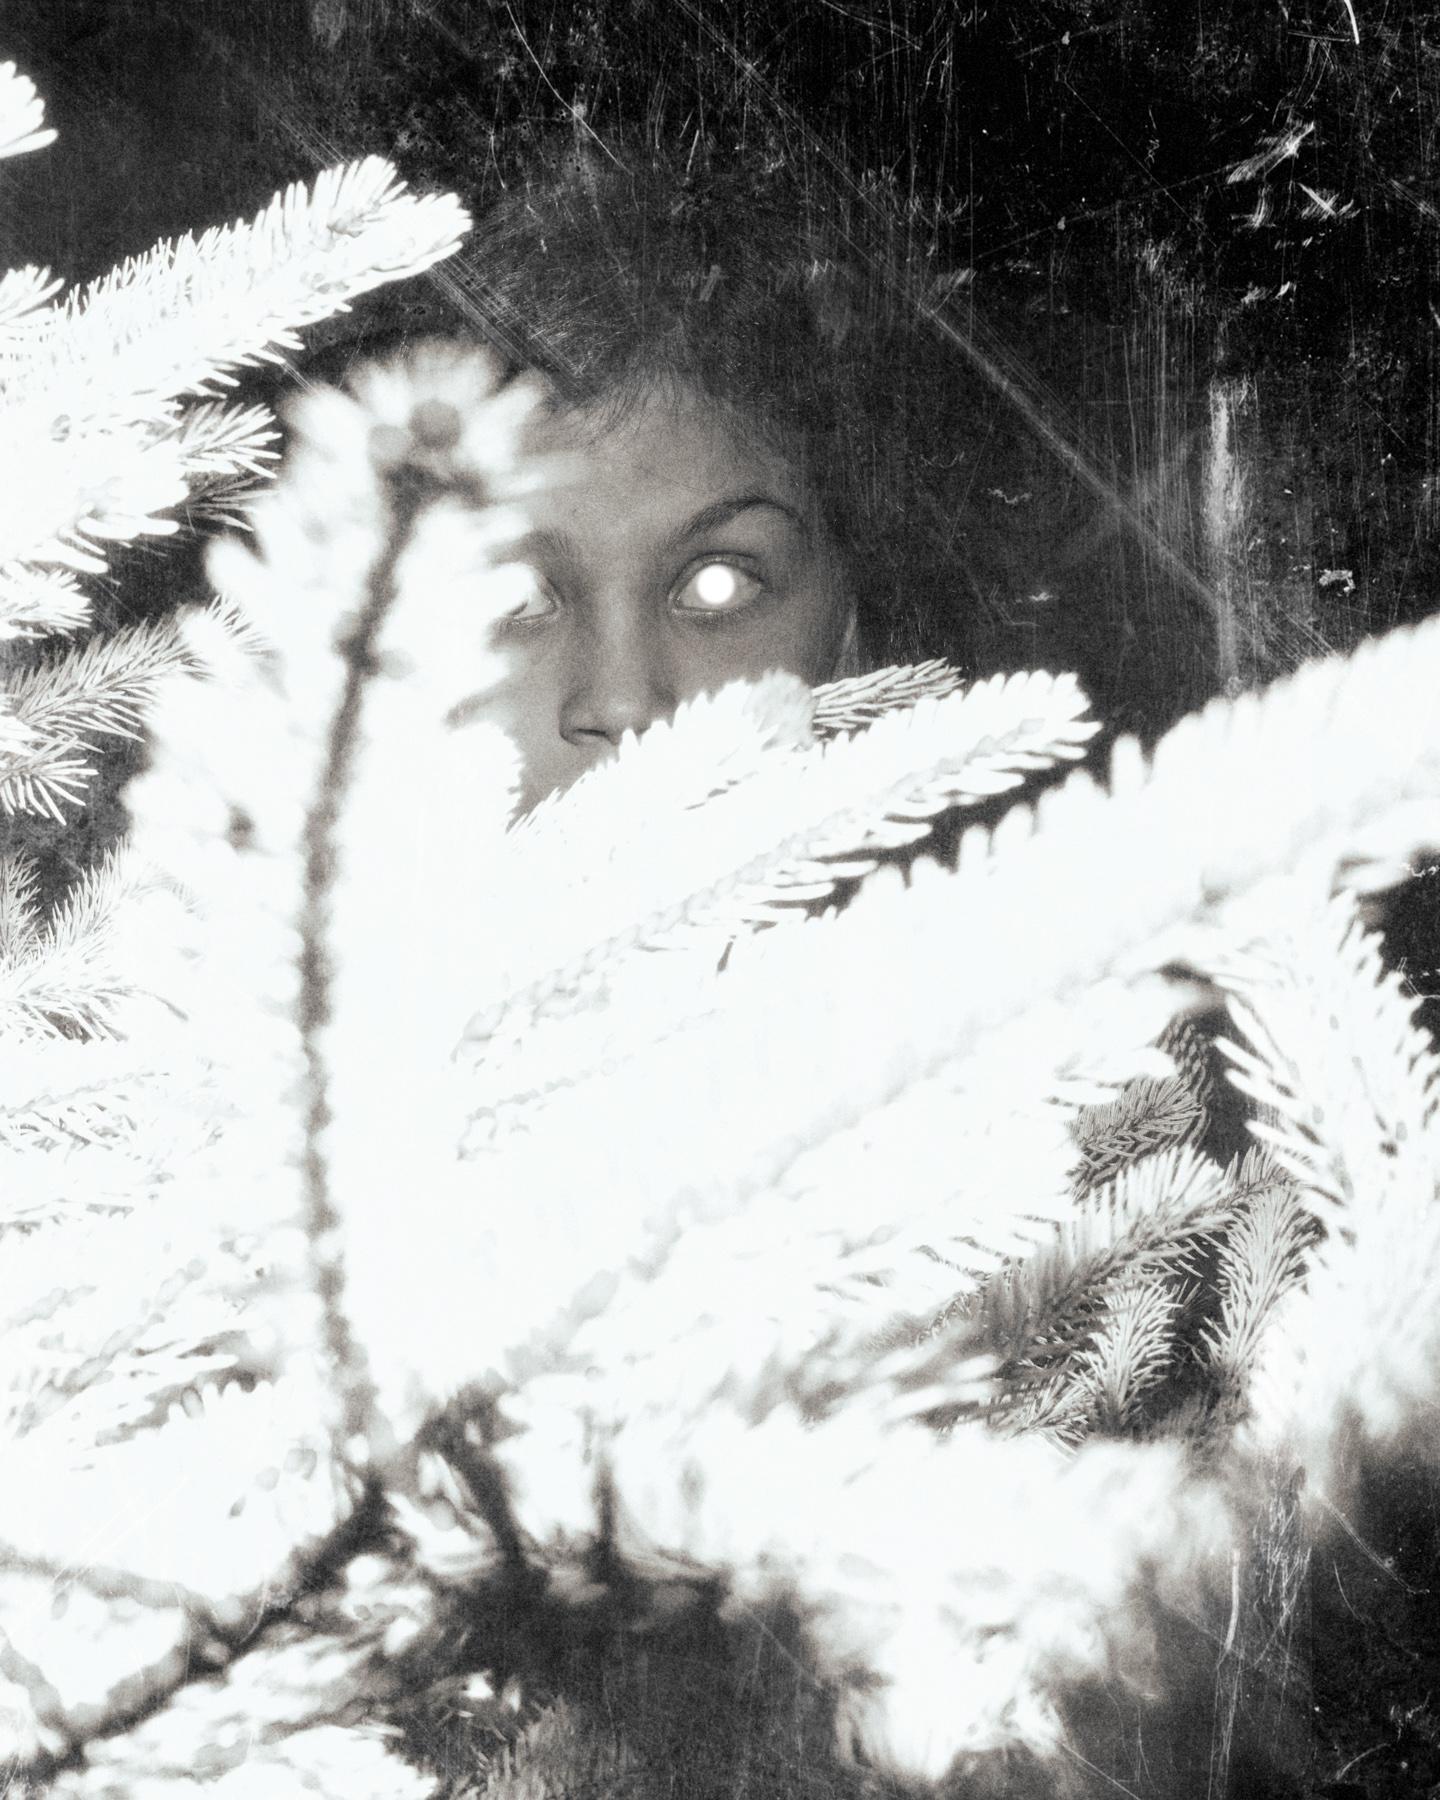 Silver Eyed © Paul Thulin